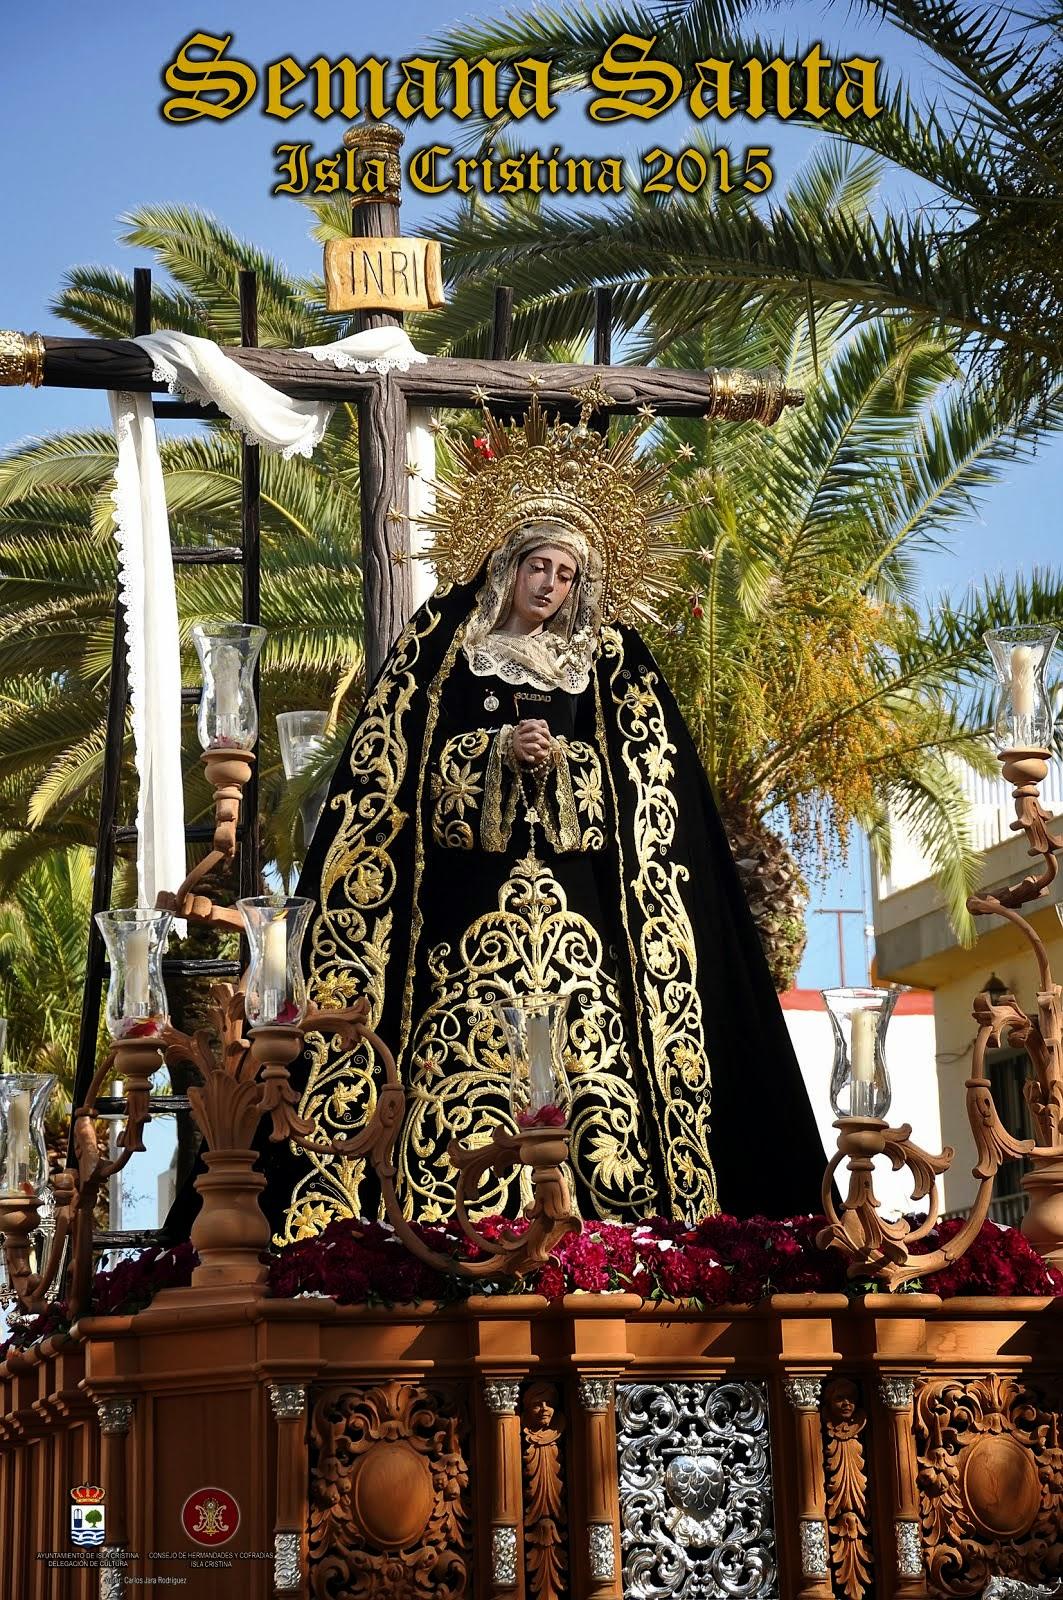 Exposición de Fotografías de Semana Santa 2015 en Isla Cristina